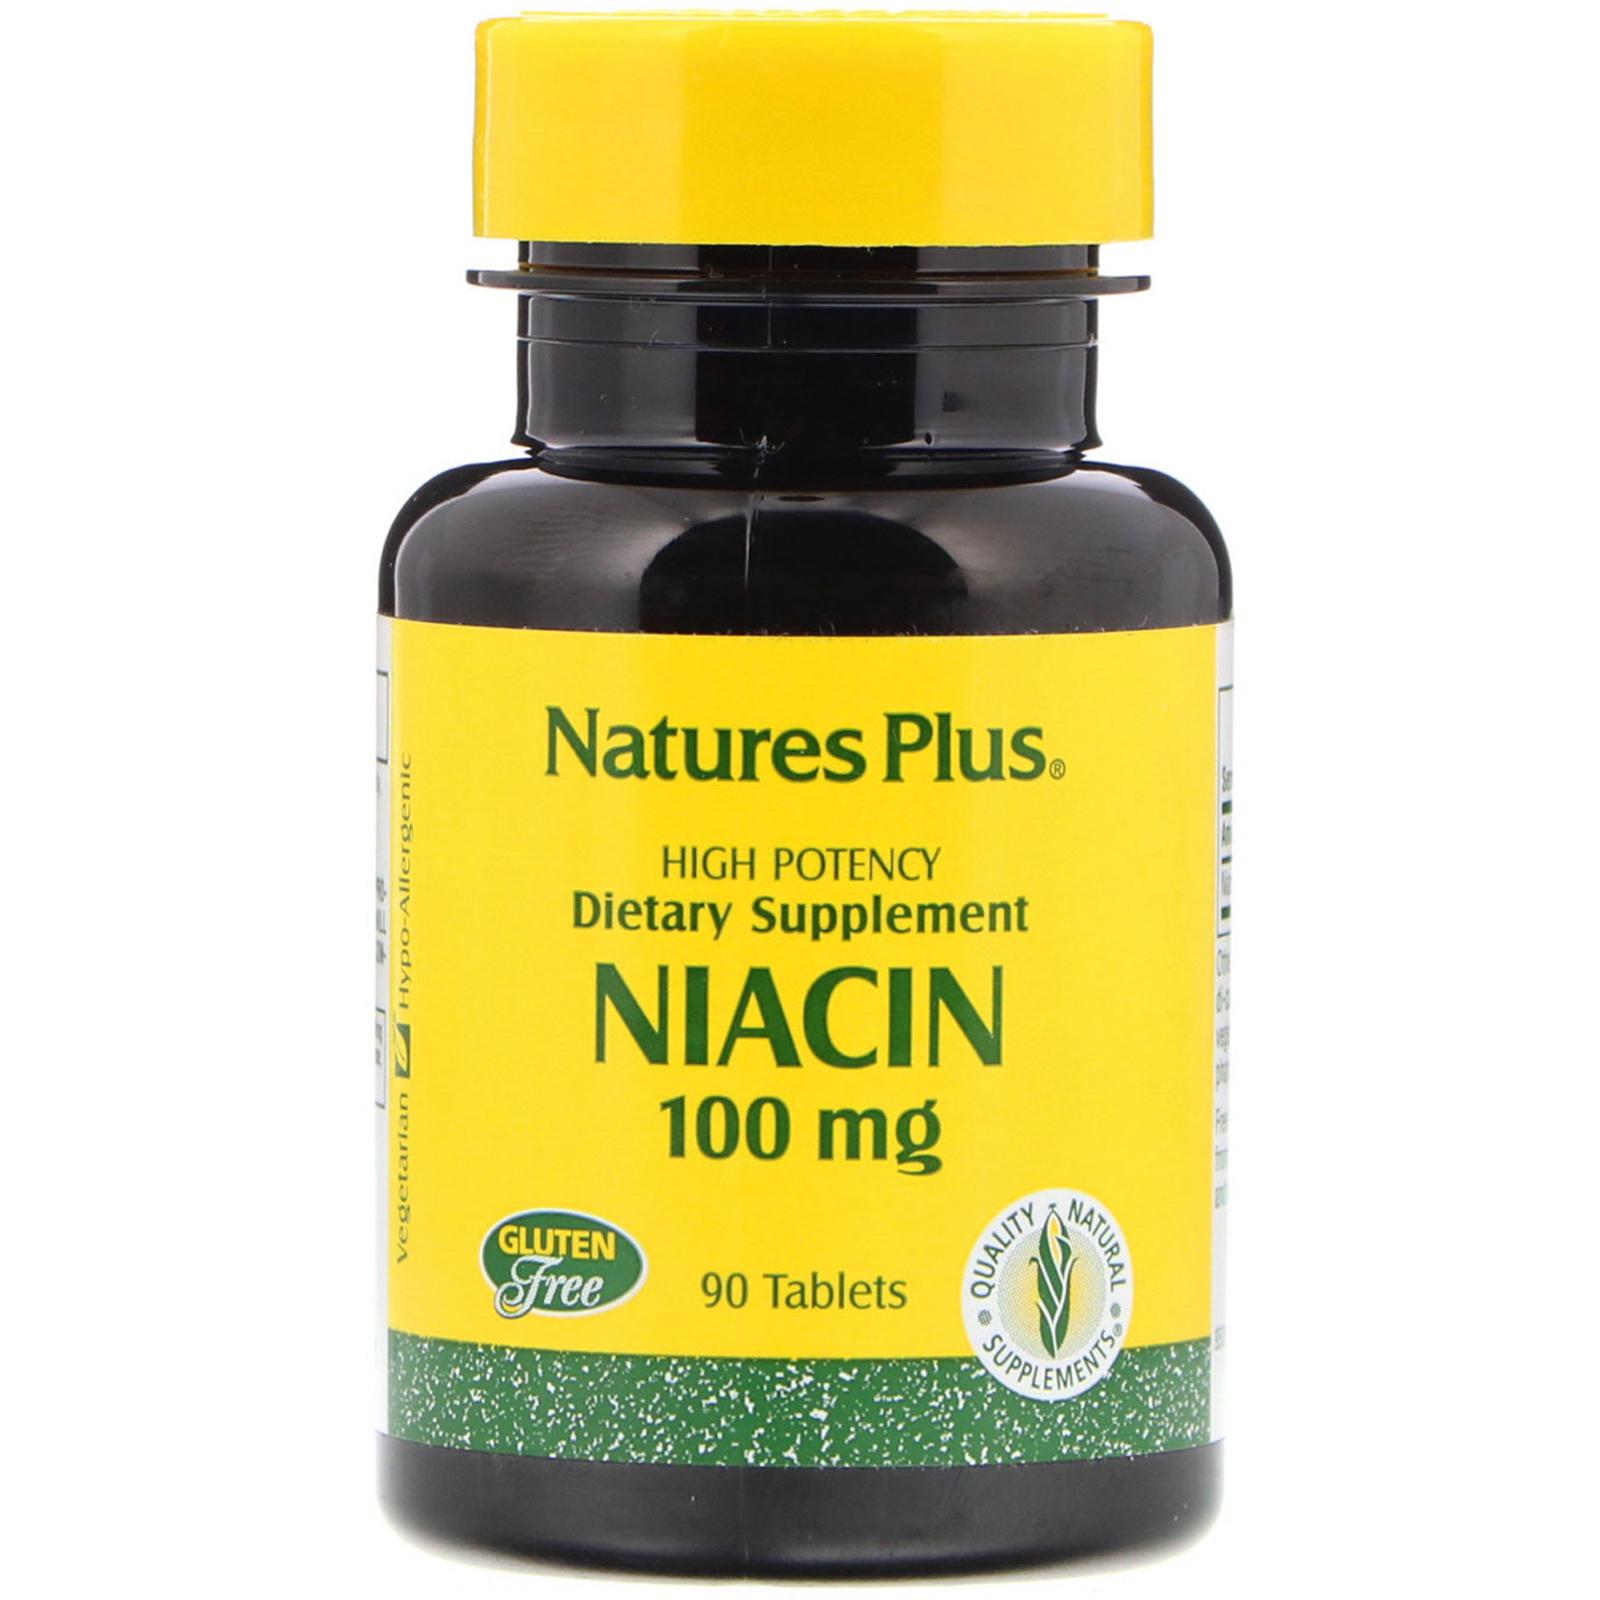 Nature's Plus, Niacin, 100 mg, 90 Tablets - iHerb com